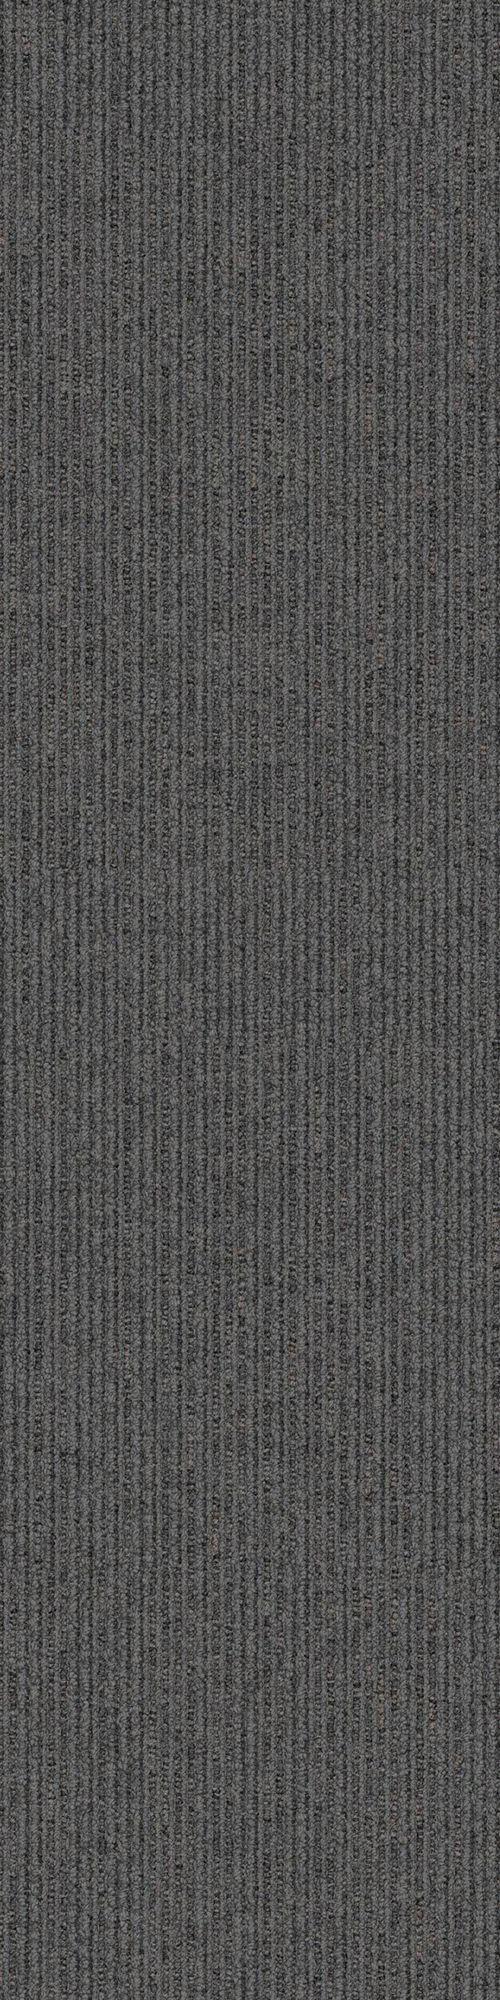 Interface carpet tile: On Line Color name: Pewter Variant 7